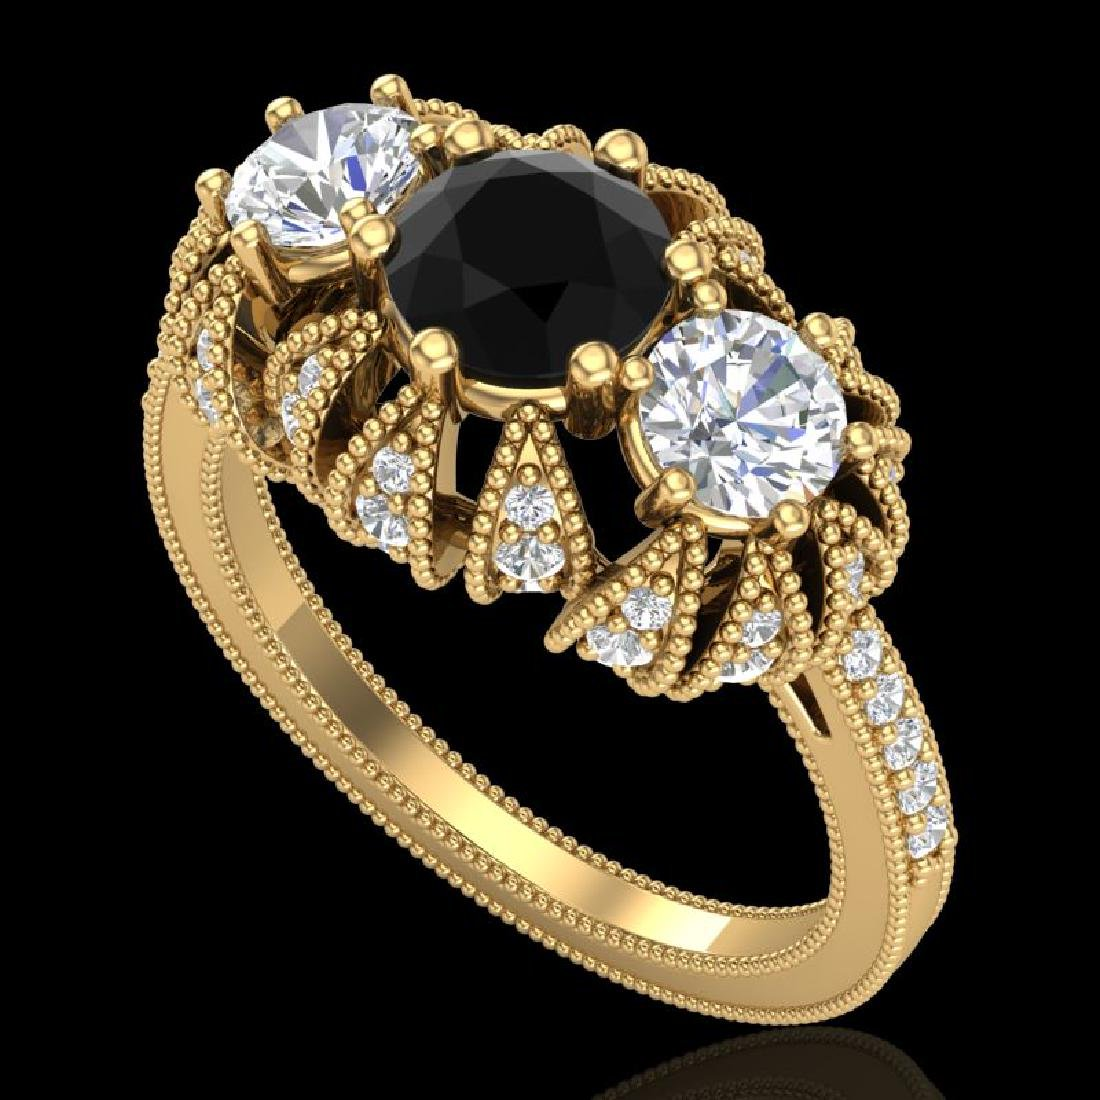 2.26 CTW Fancy Black Diamond Solitaire Art Deco 3 Stone